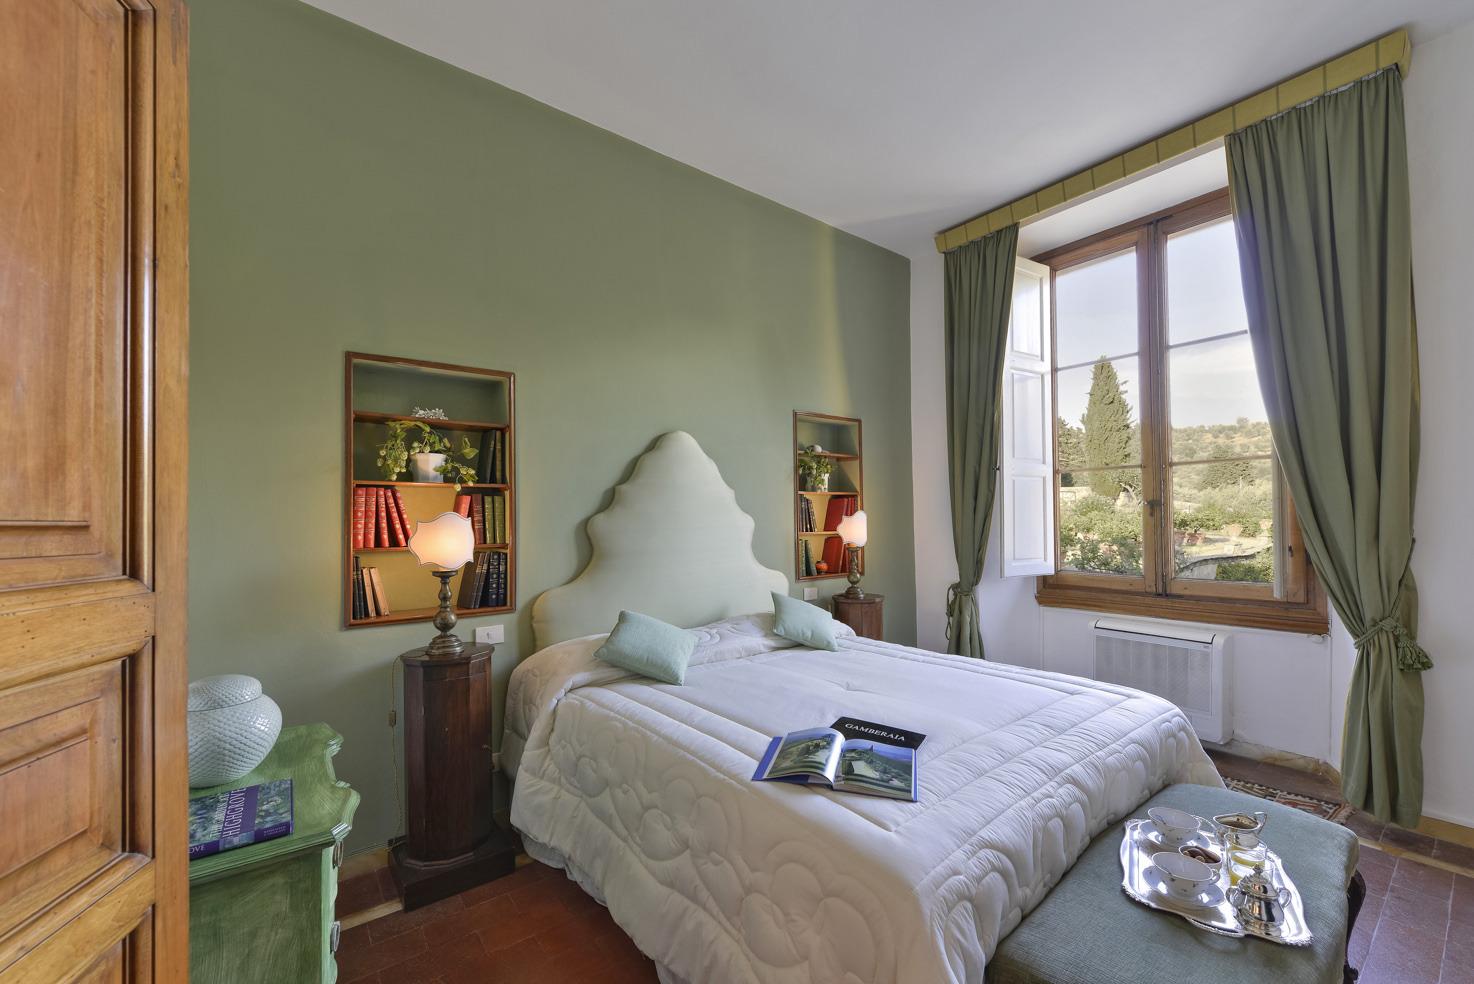 Accommodation at Villa Gamberaia